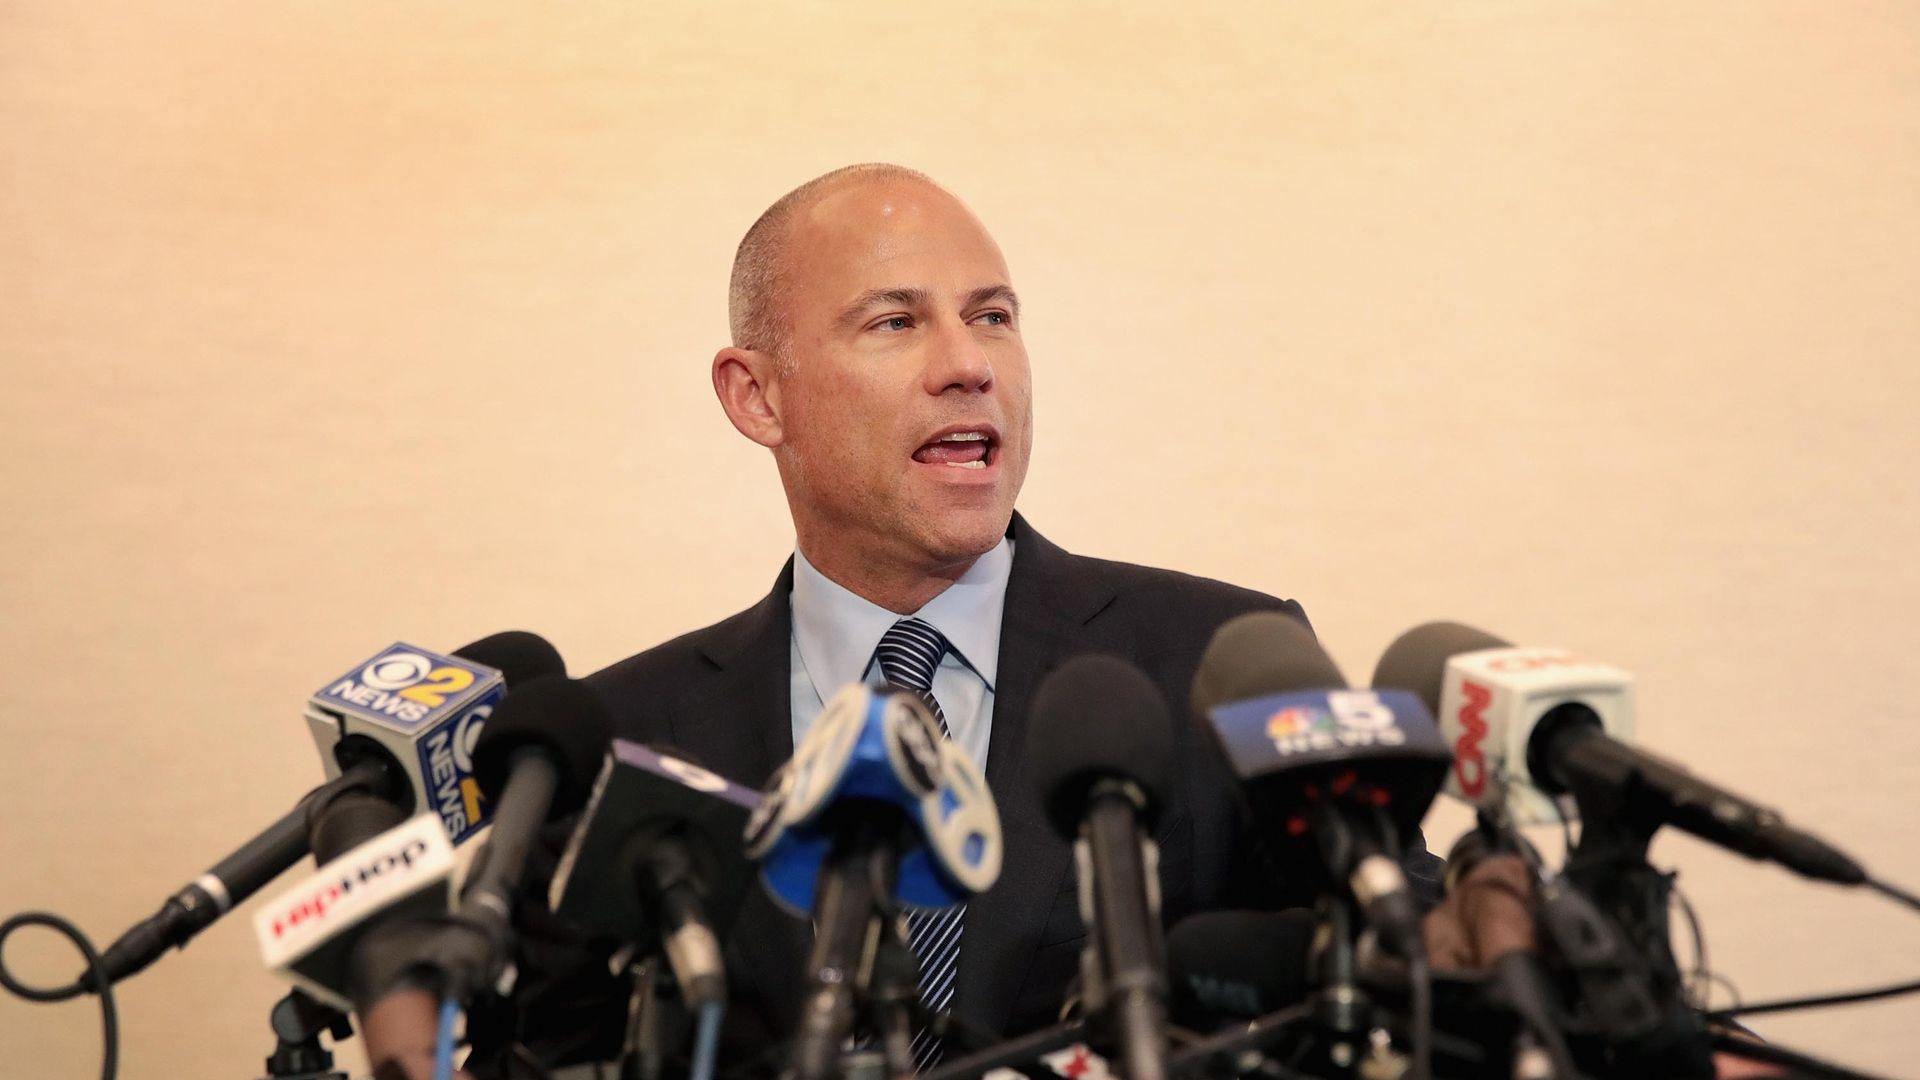 Celebrity lawyer Michael Avenatti represented Stormy Daniels